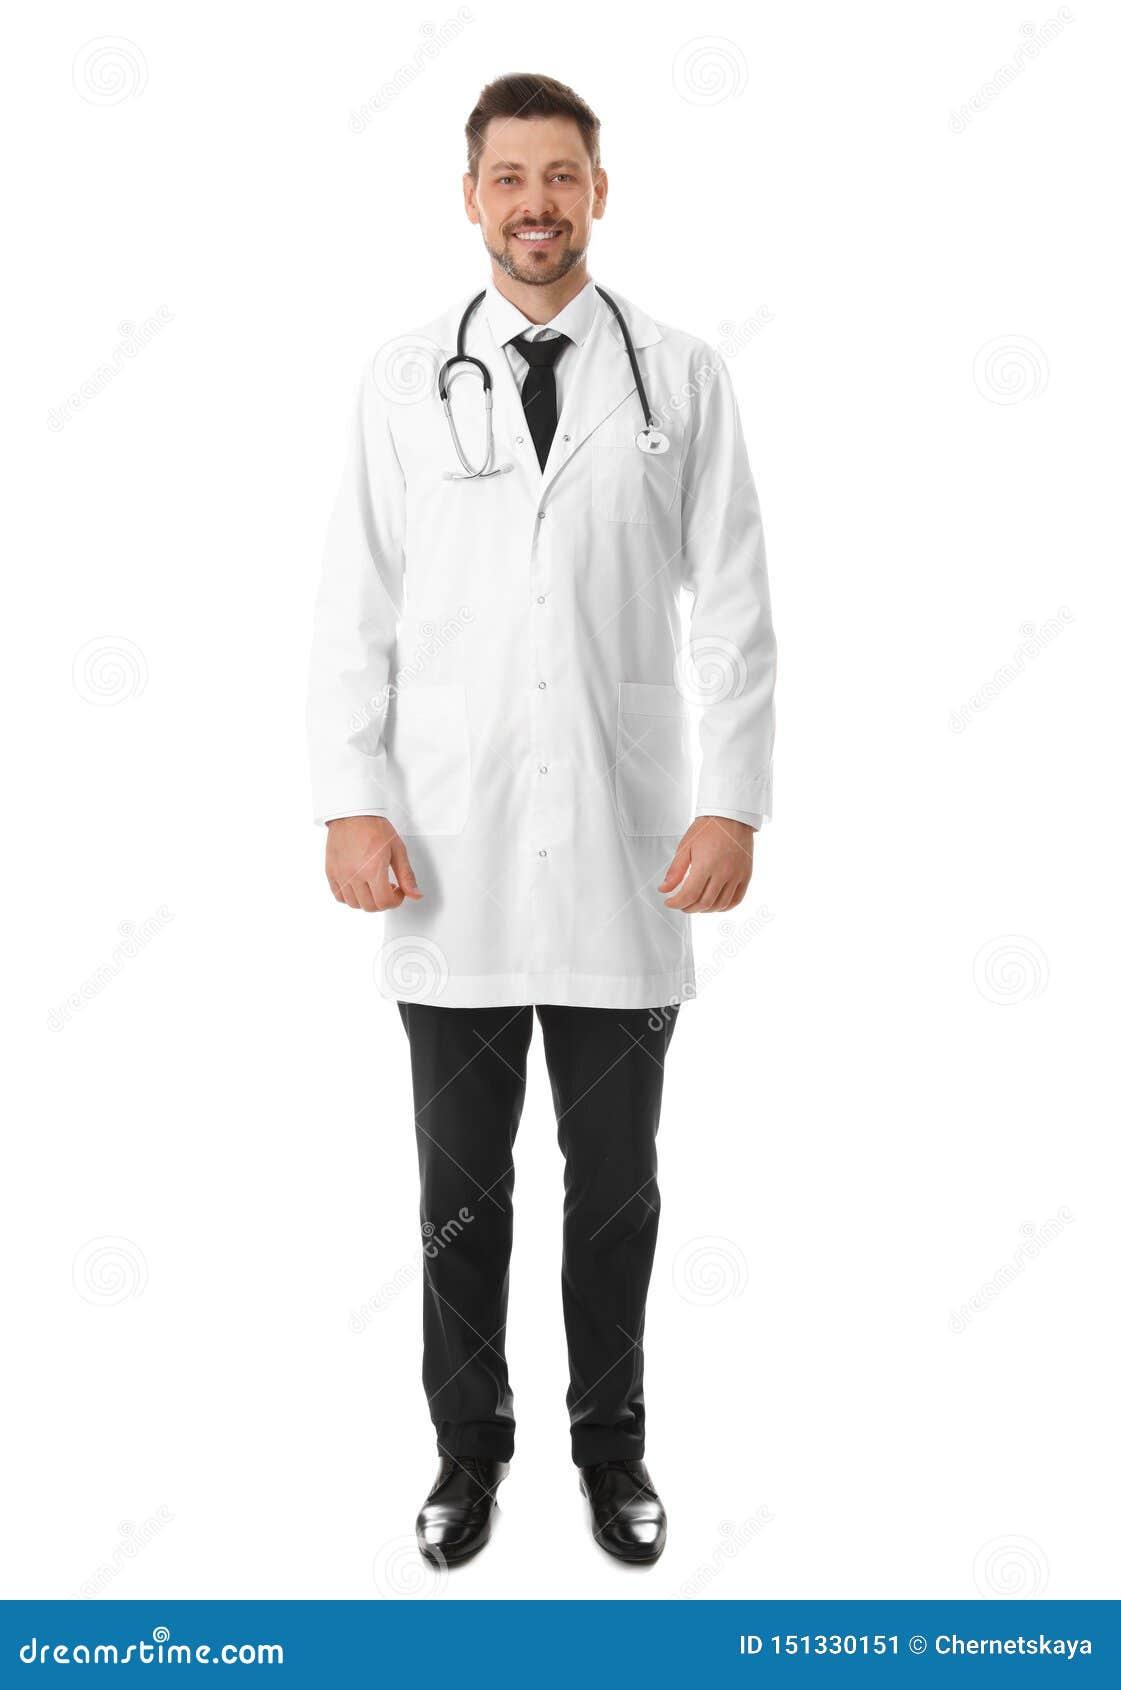 Full length portrait of smiling male doctor. Medical staff